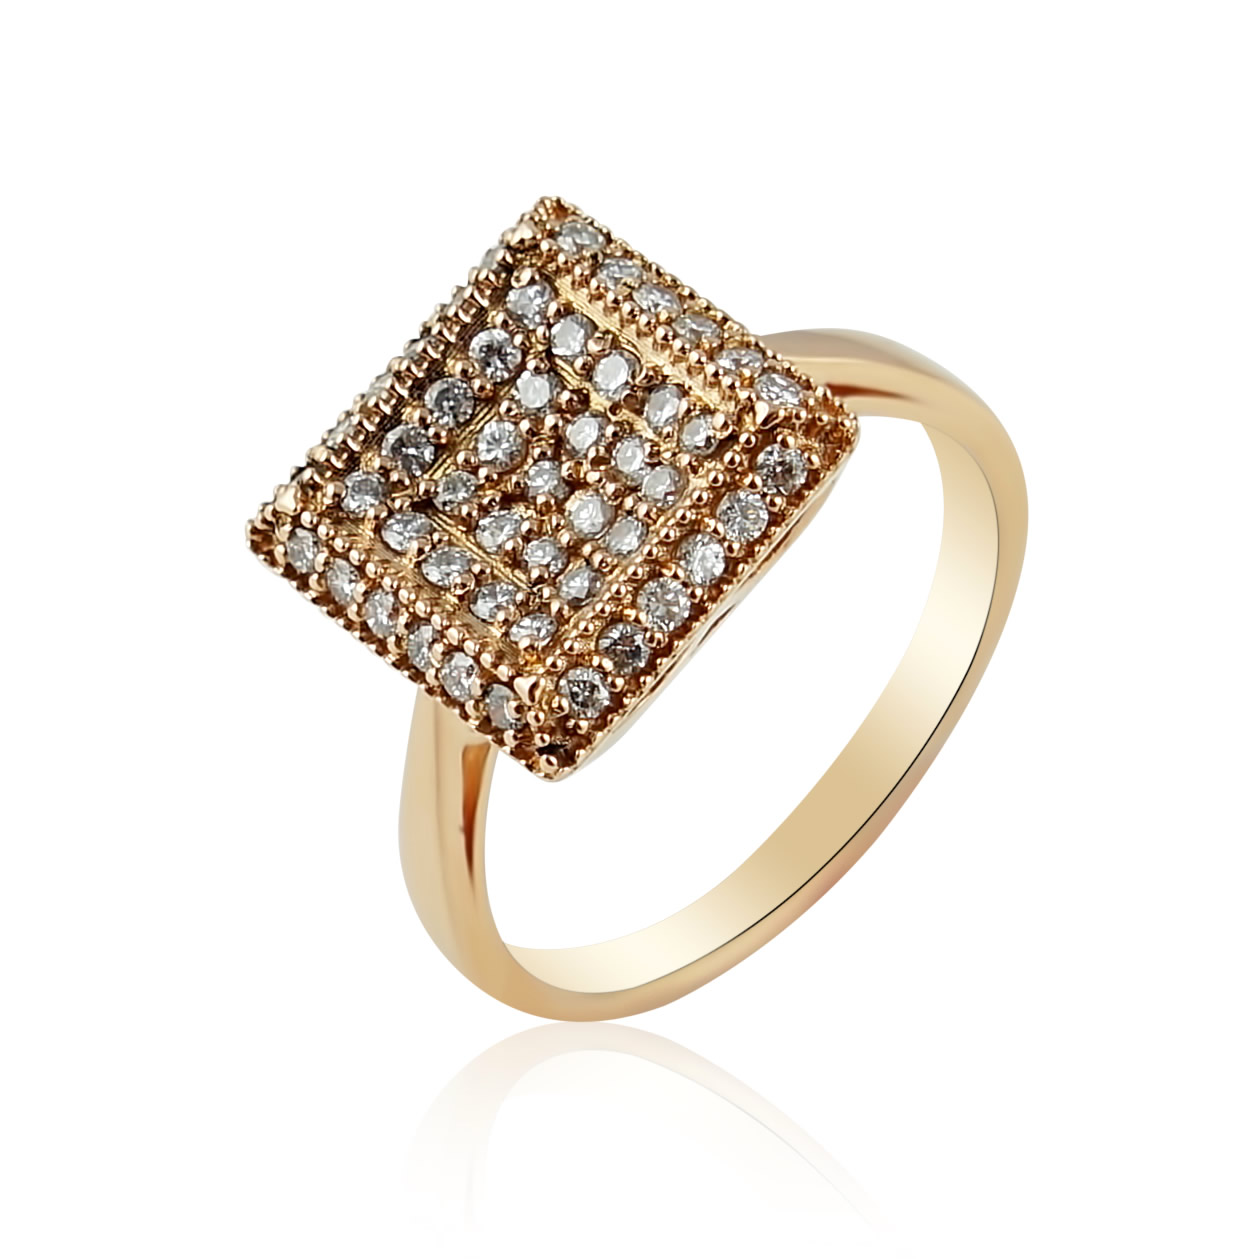 Diamant ring umarbeiten